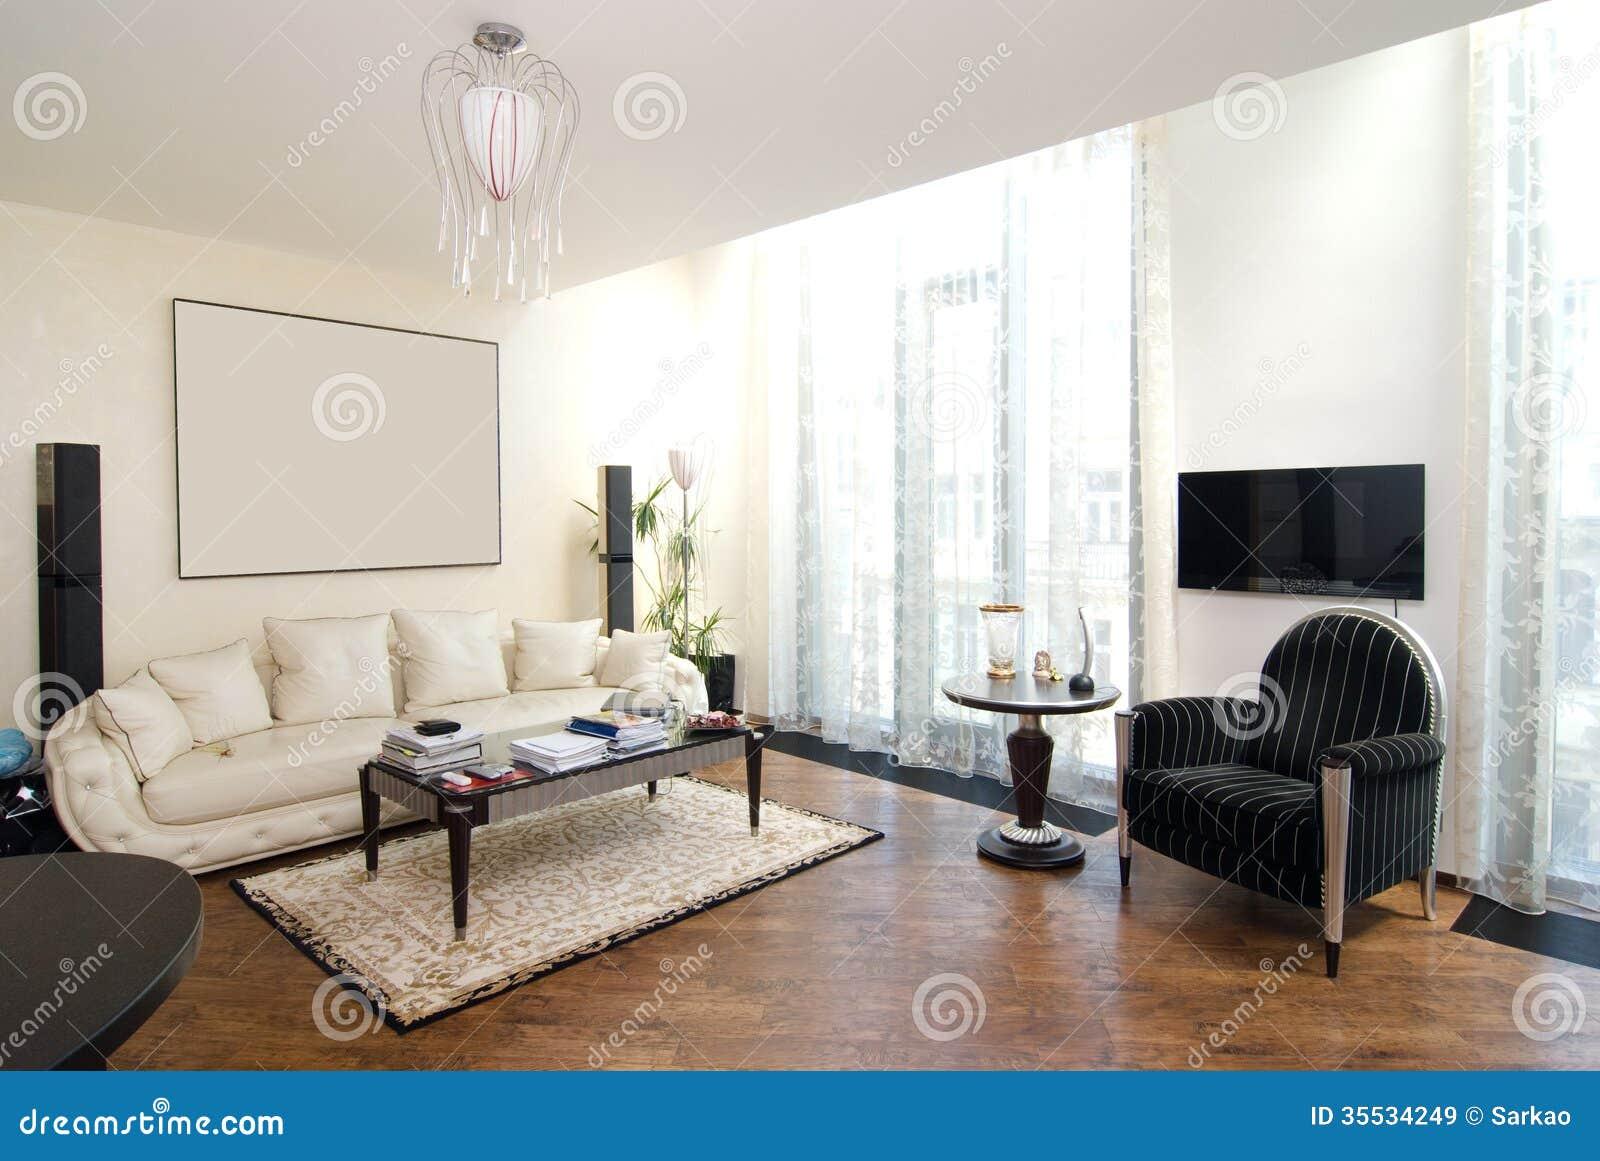 salon moderne de luxe - Salon Moderne Deluxe